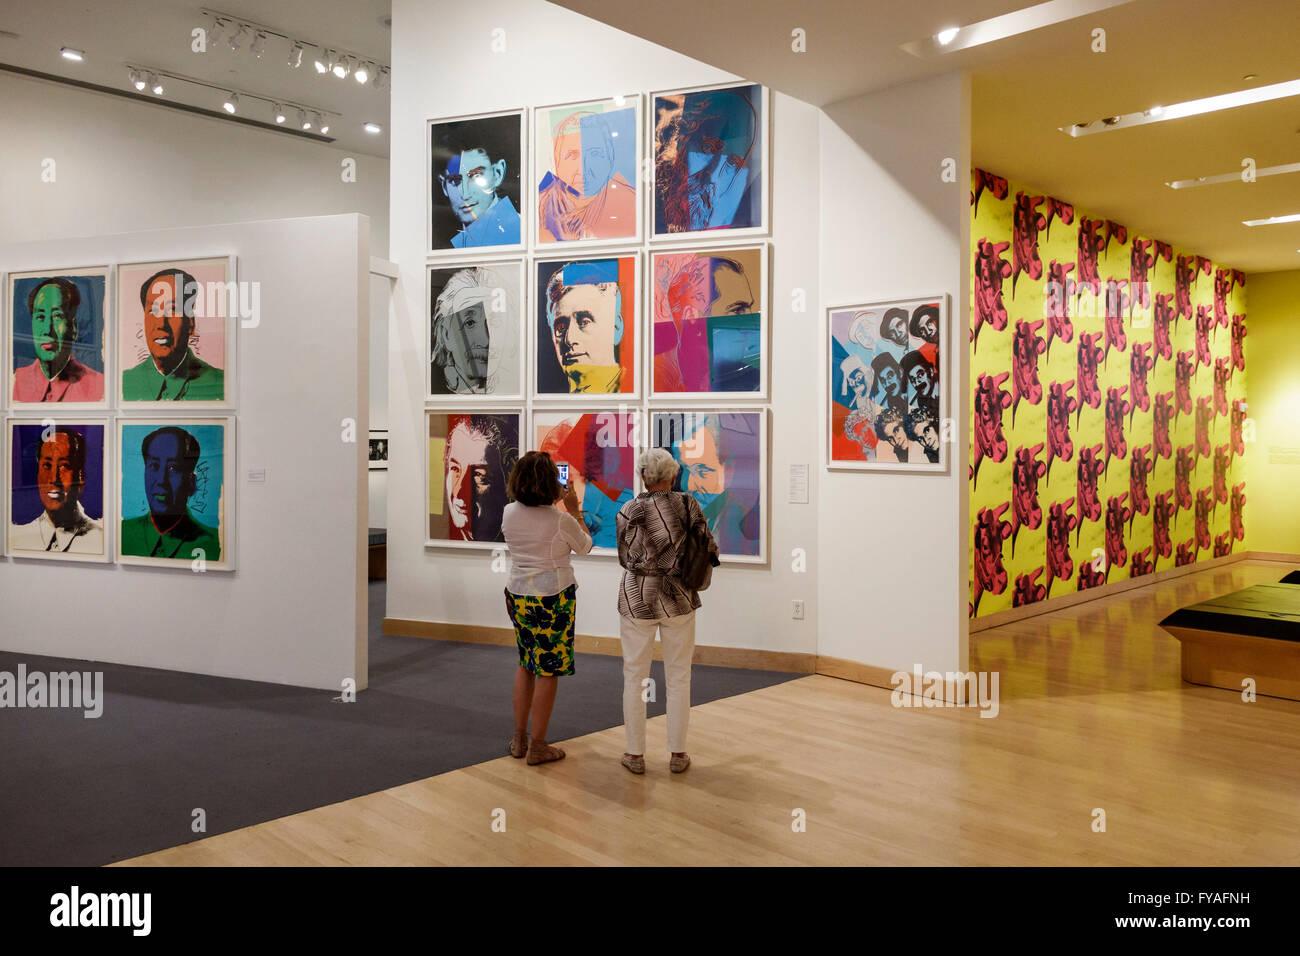 Boca Raton Florida Boca Raton Museum Of Art Andy Warhol Exhibit Stock Photo Royalty Free Image